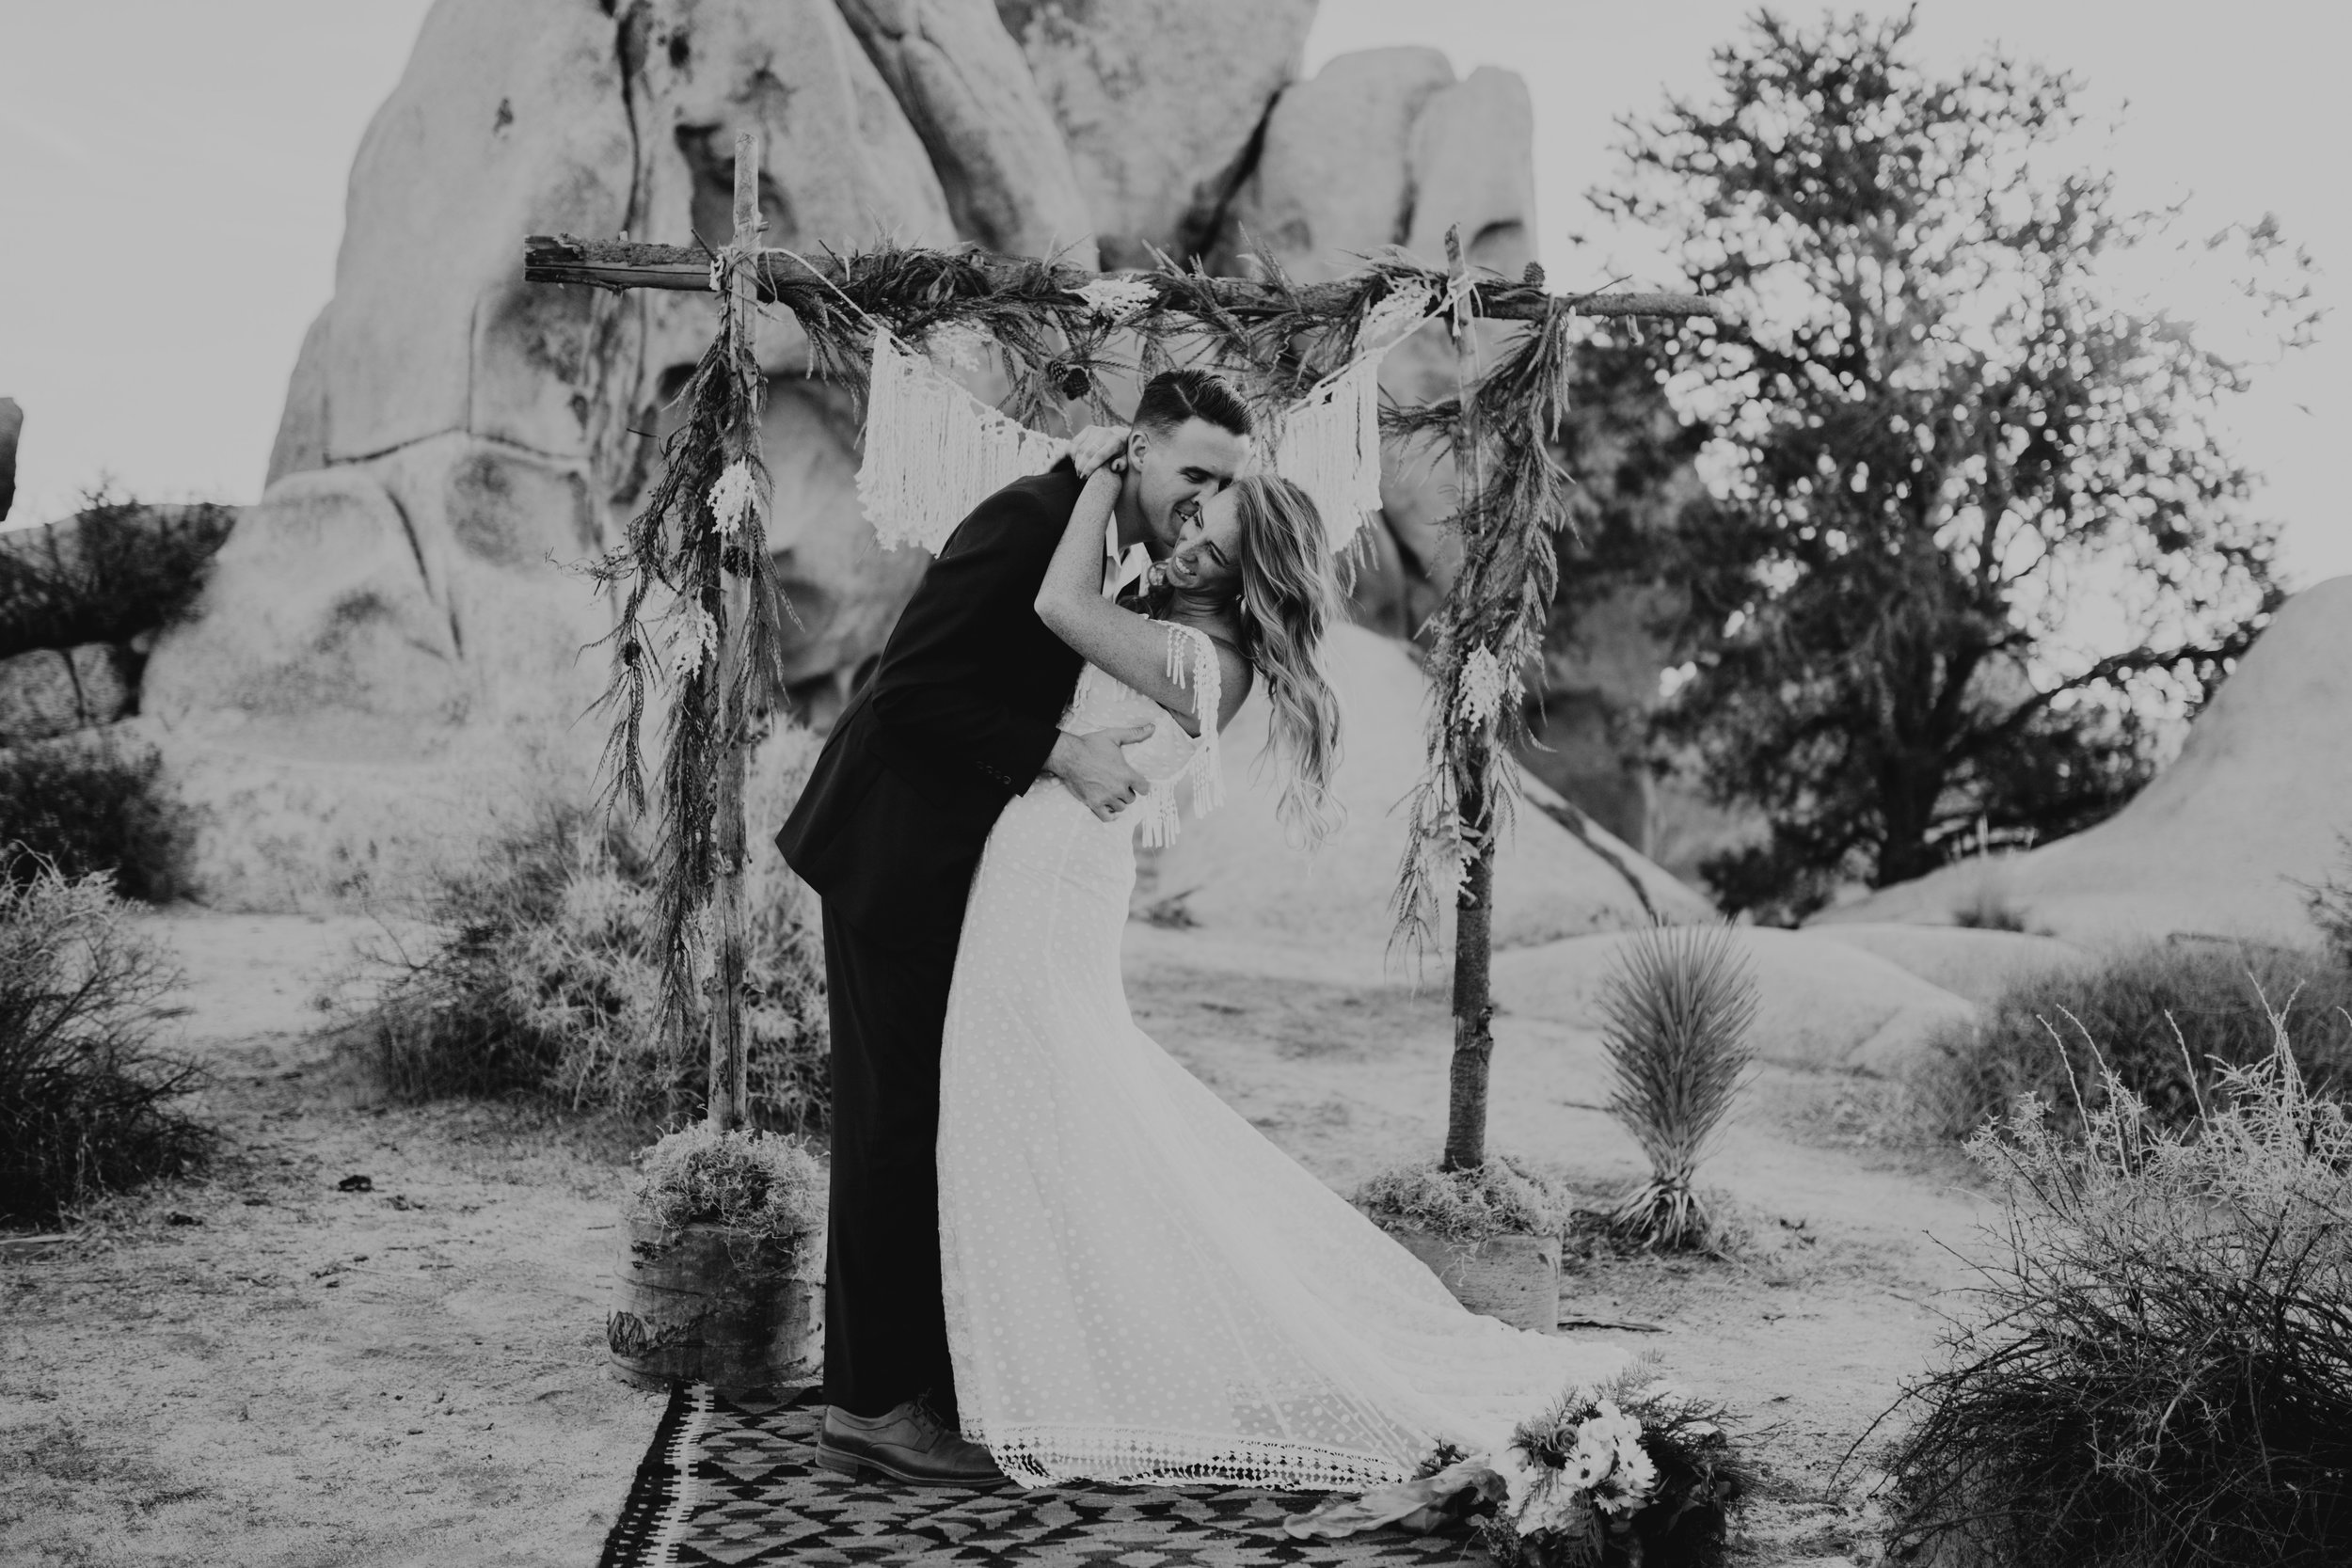 palmsprings_joshuatree_california_wedding_photographer-17.jpg